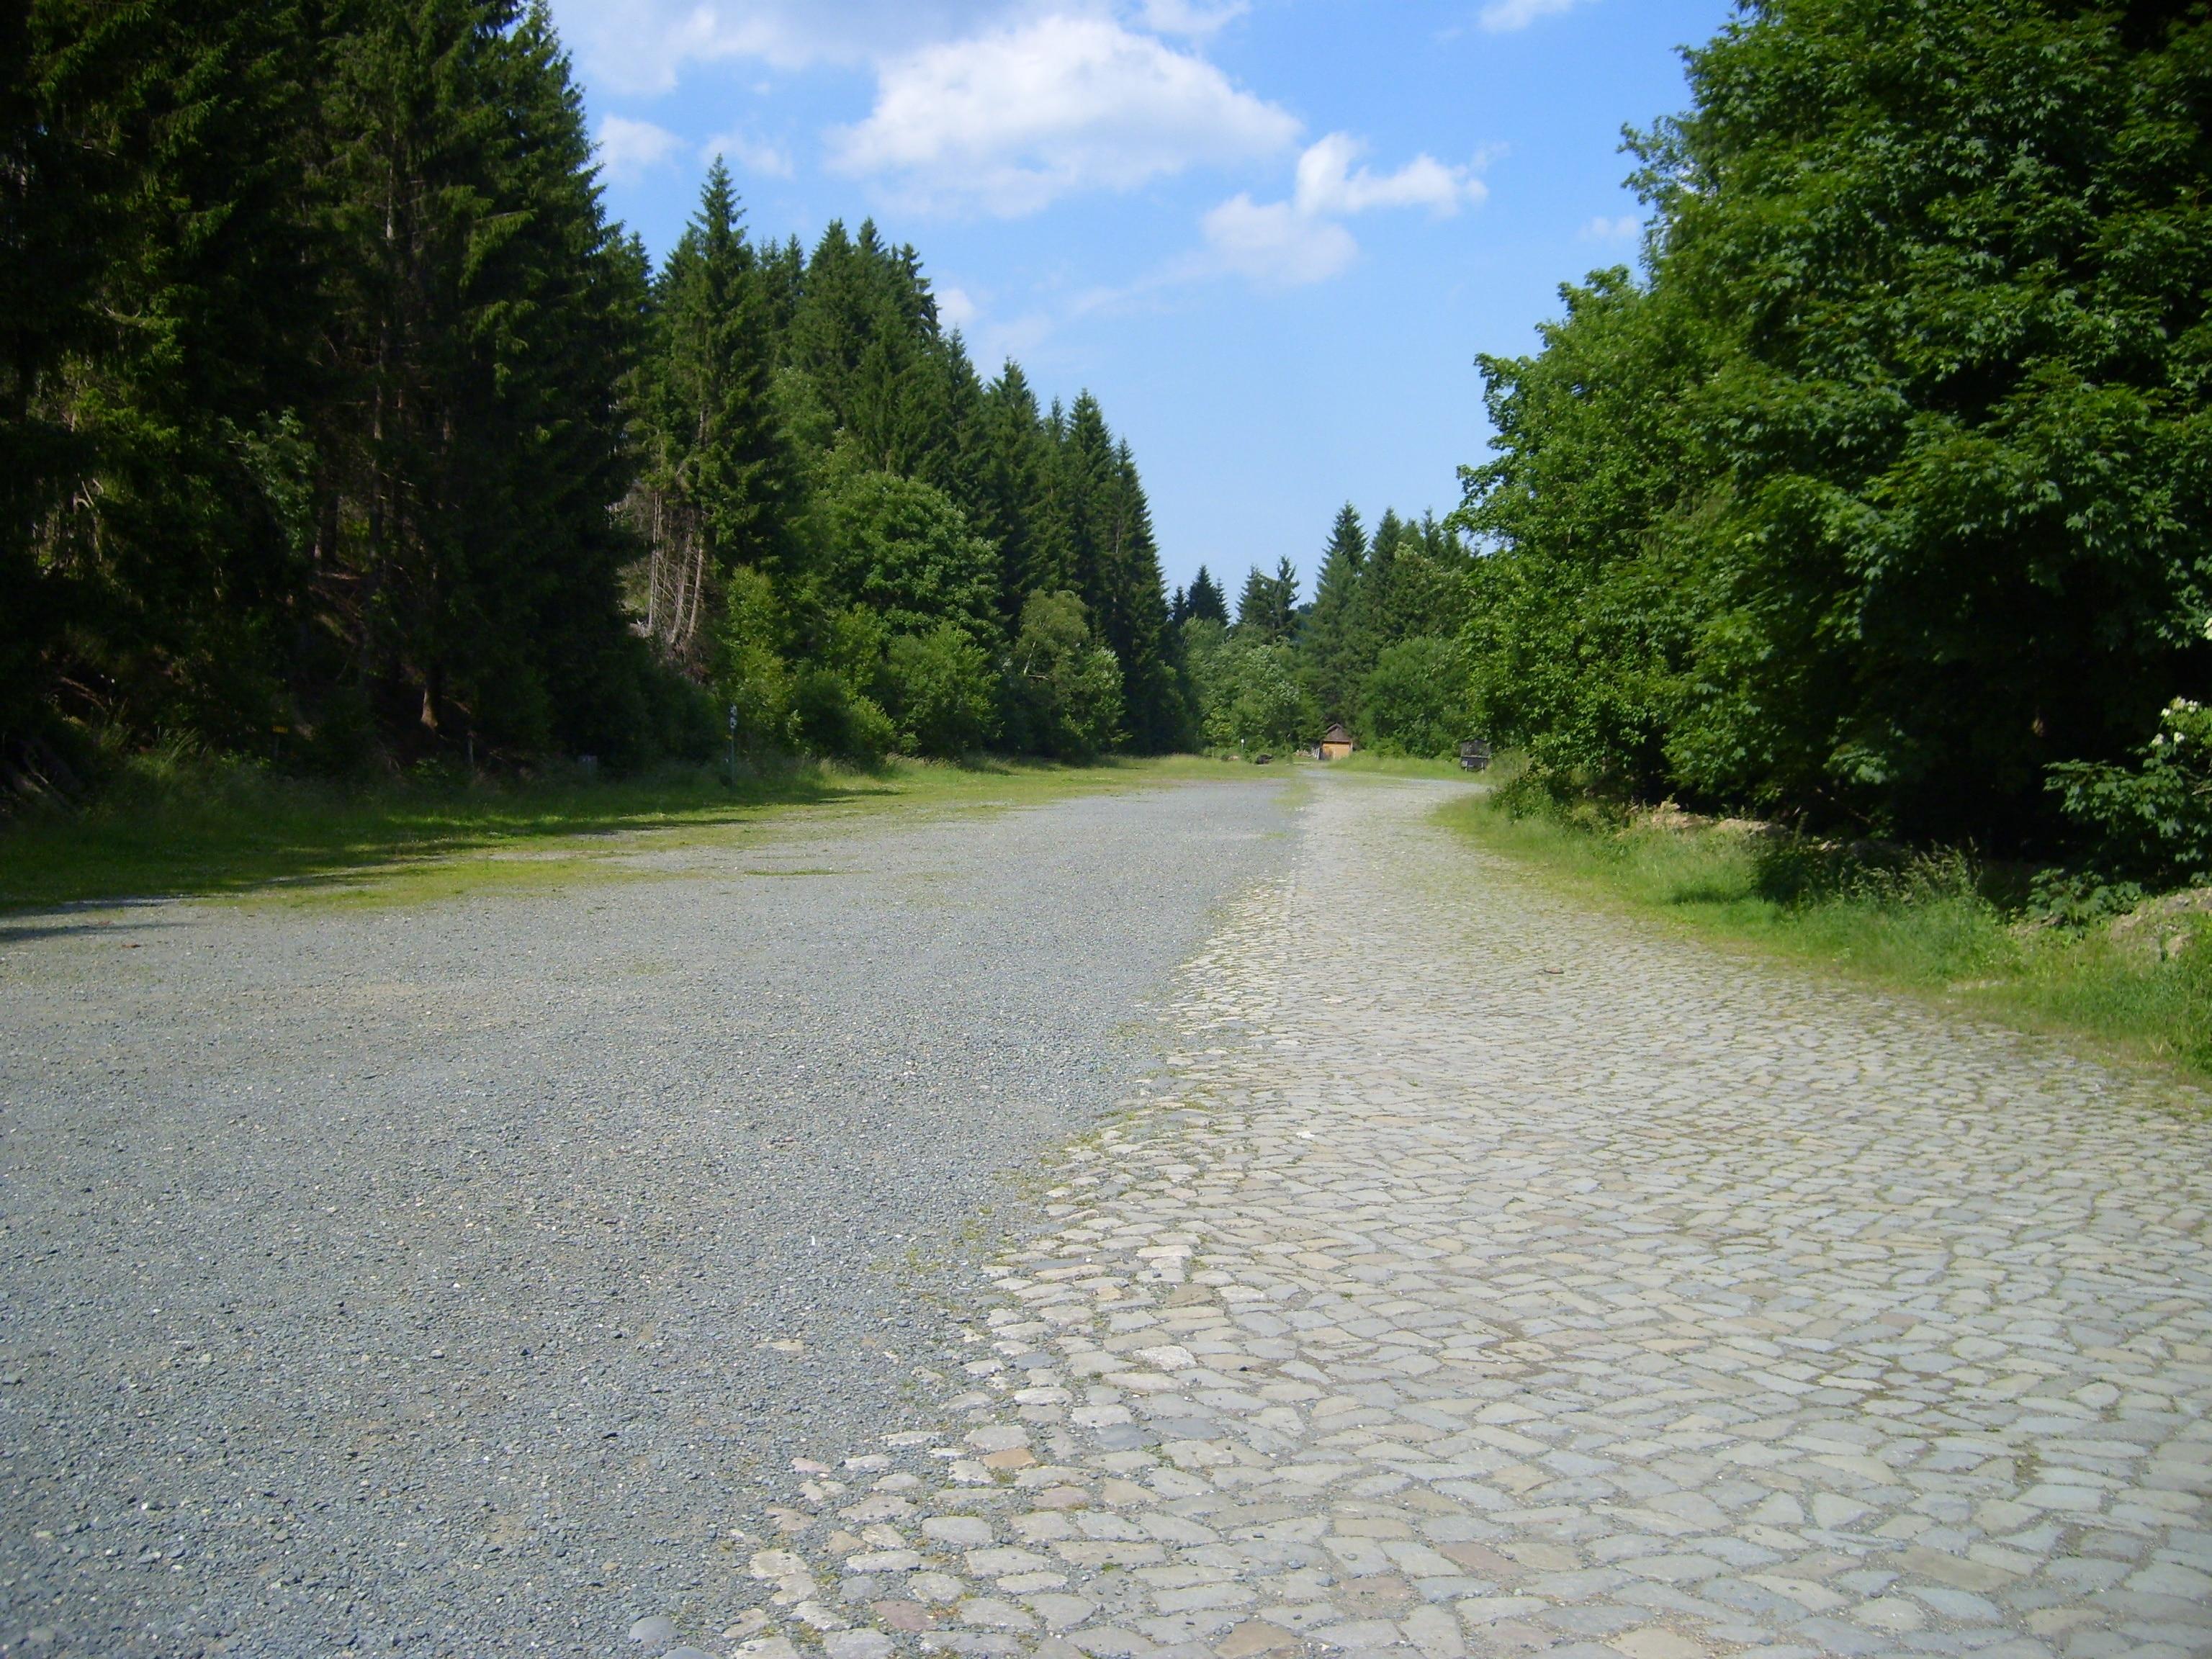 Altenau, Clausthal-Zellerfeld, Ala-Saksi, Saksa